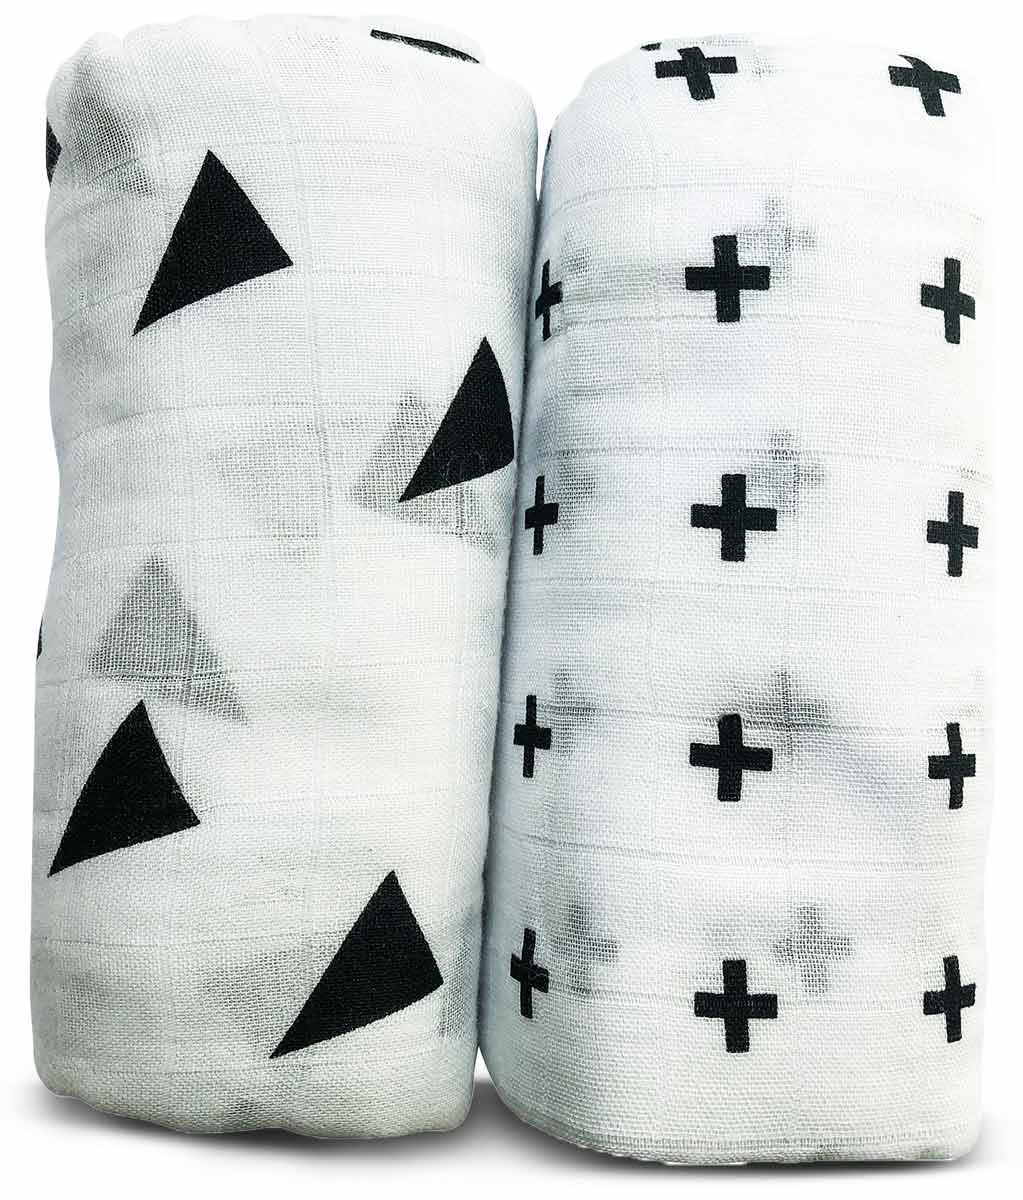 NEVO | זוג חיתולי טטרה במבוק גדולים במיוחד באריזת מתנה - עיצוב שחור ולבןתמונה של